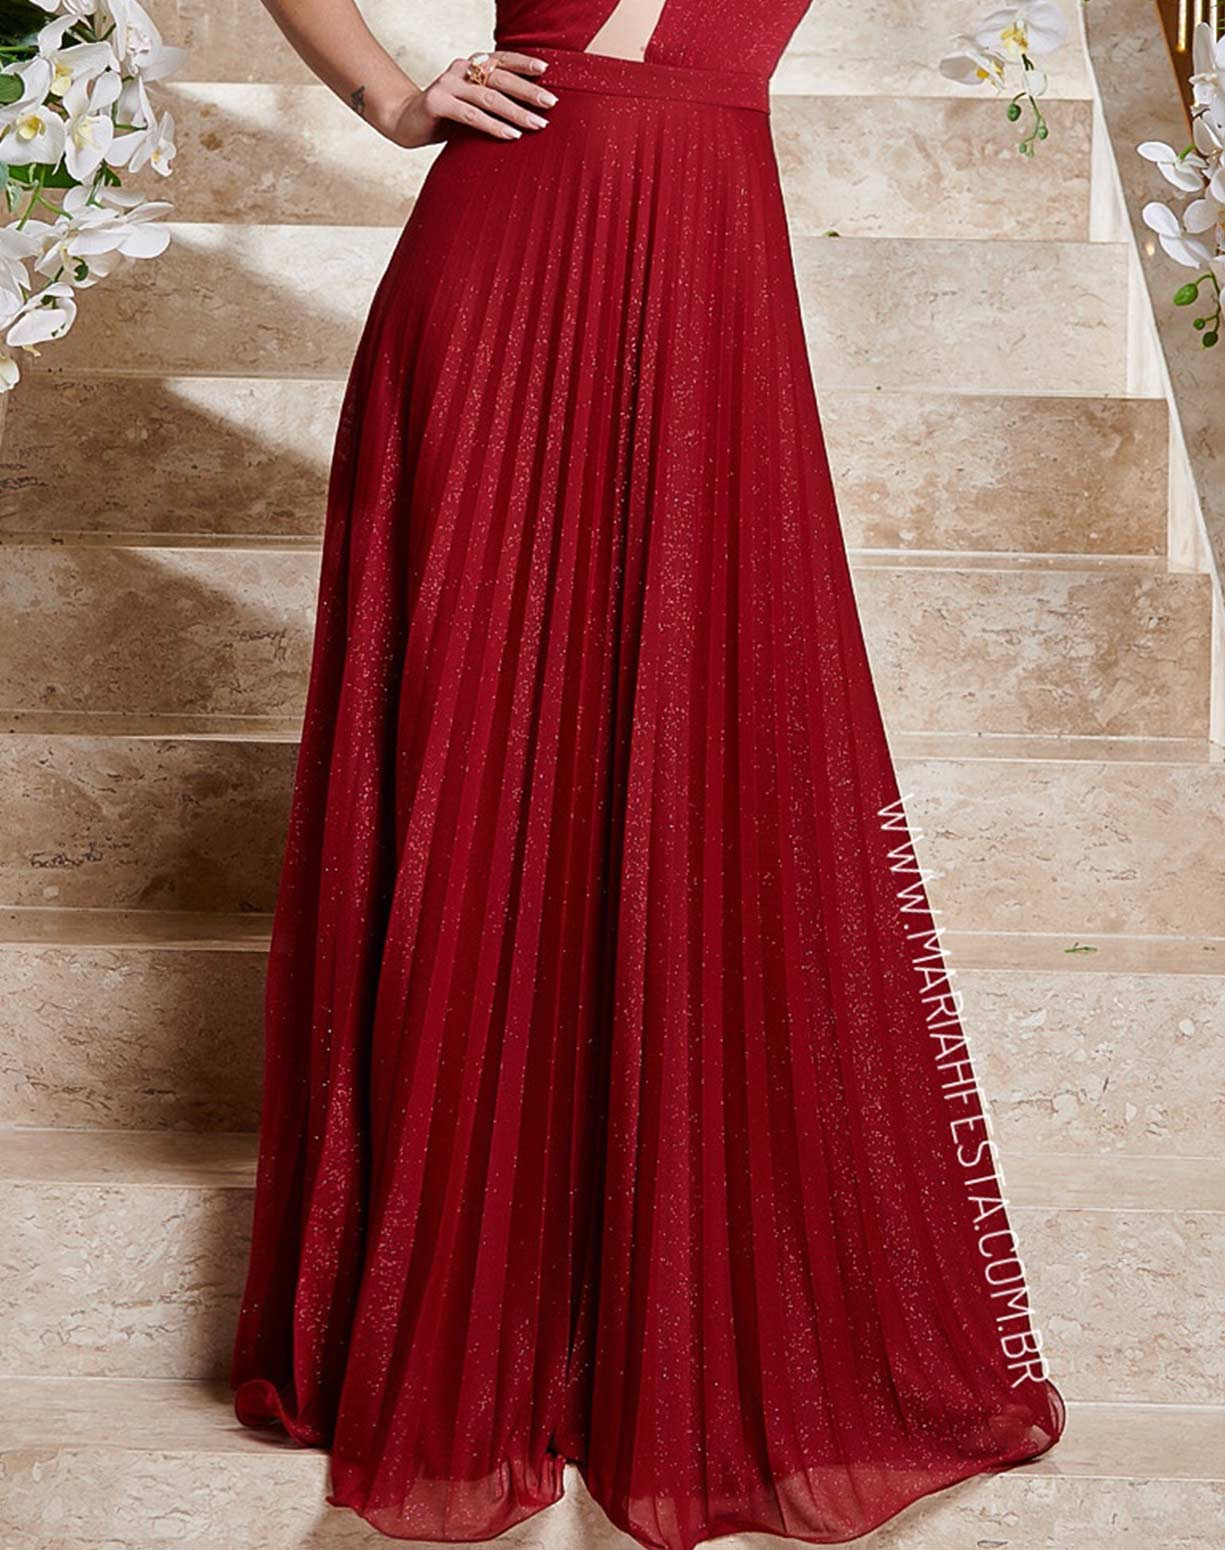 Vestido Marsala em Tule Glitter Plissado de Um Ombro Só